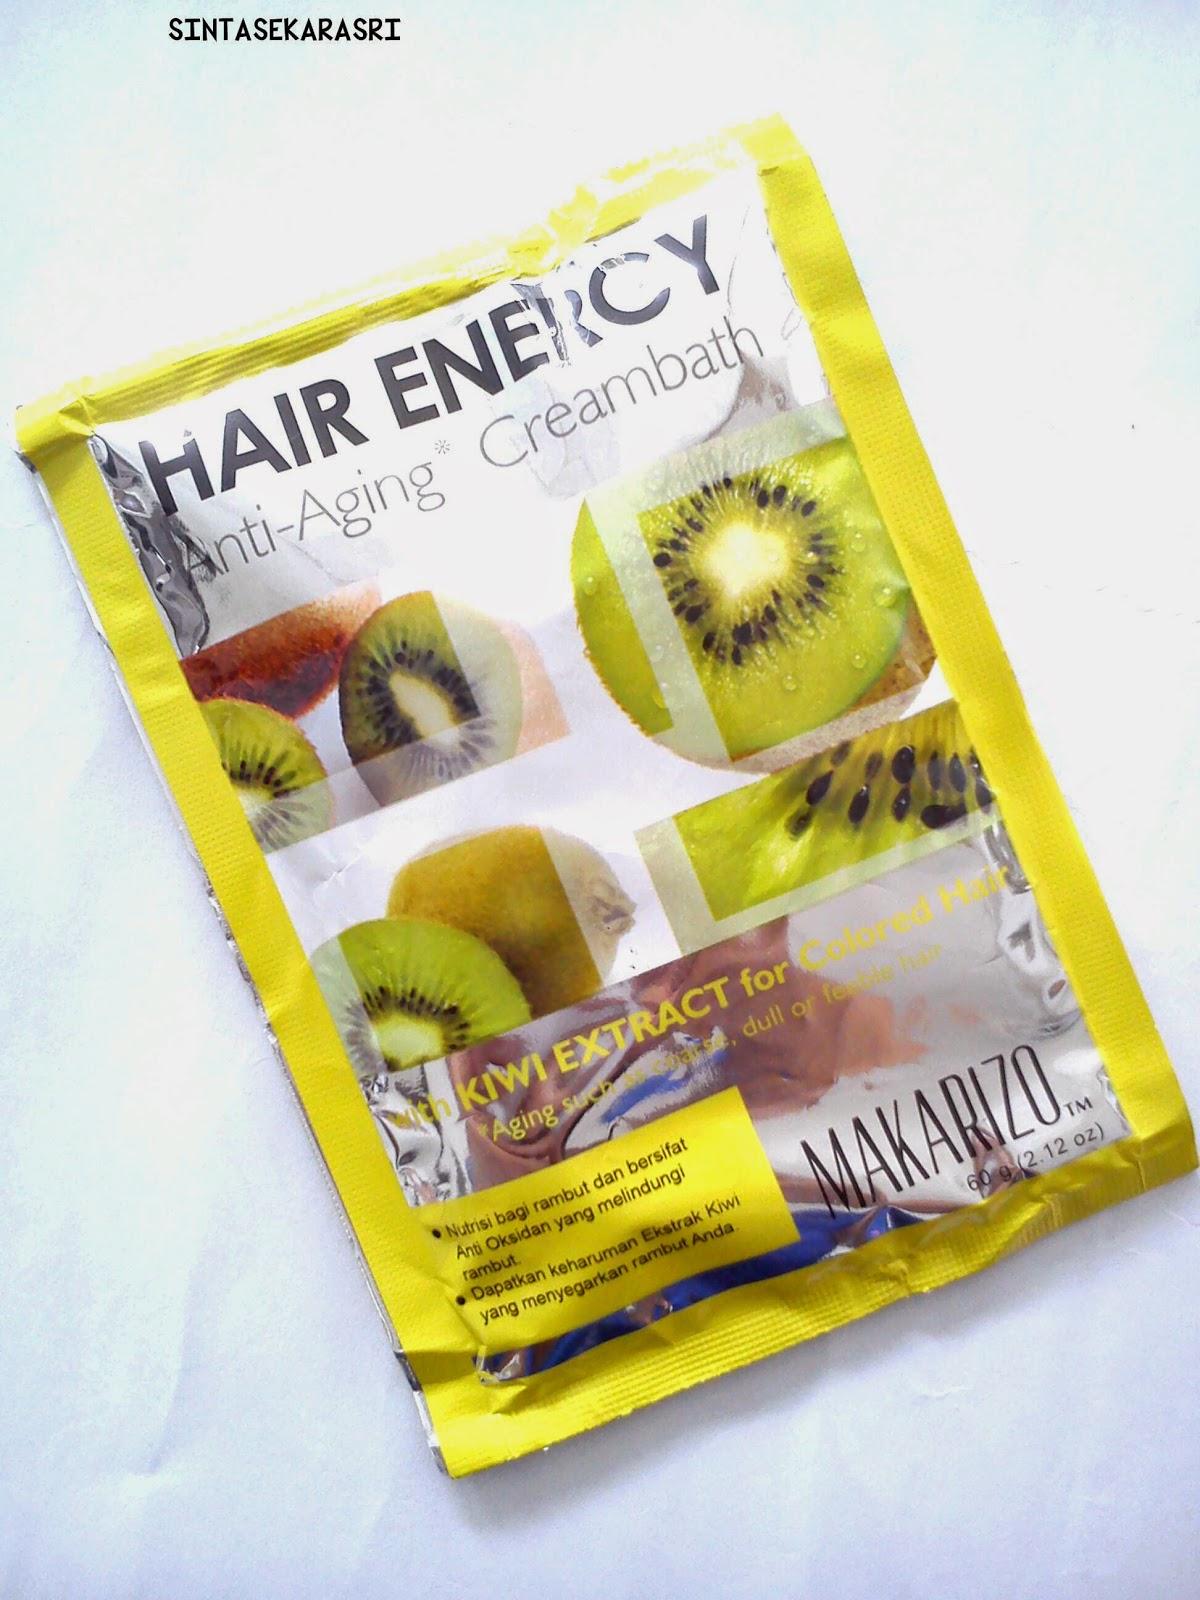 Sintas Beauty Makarizo Hair Energy Kiwi 60g X 4 Sachet Haha Sorry Nggak Ada Foto Kondisi Rambut Soalnya Yah Gitulah Wkwk